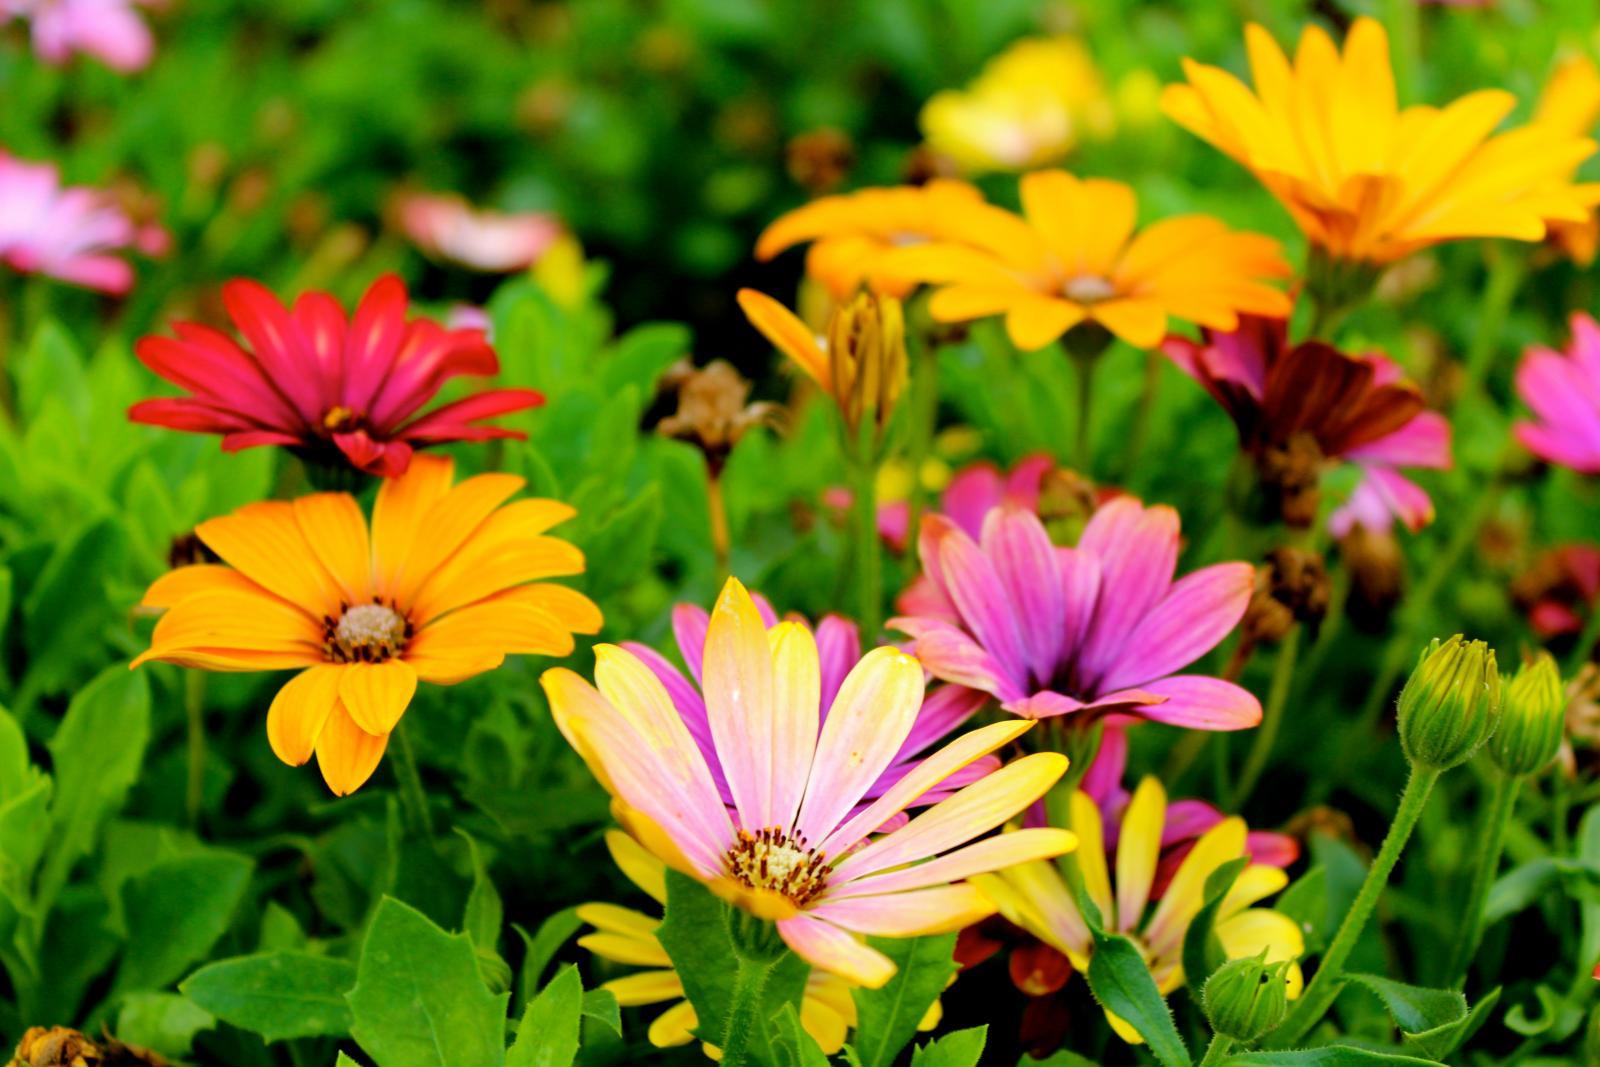 Assorted colour flowers. Photo credit: Pexels